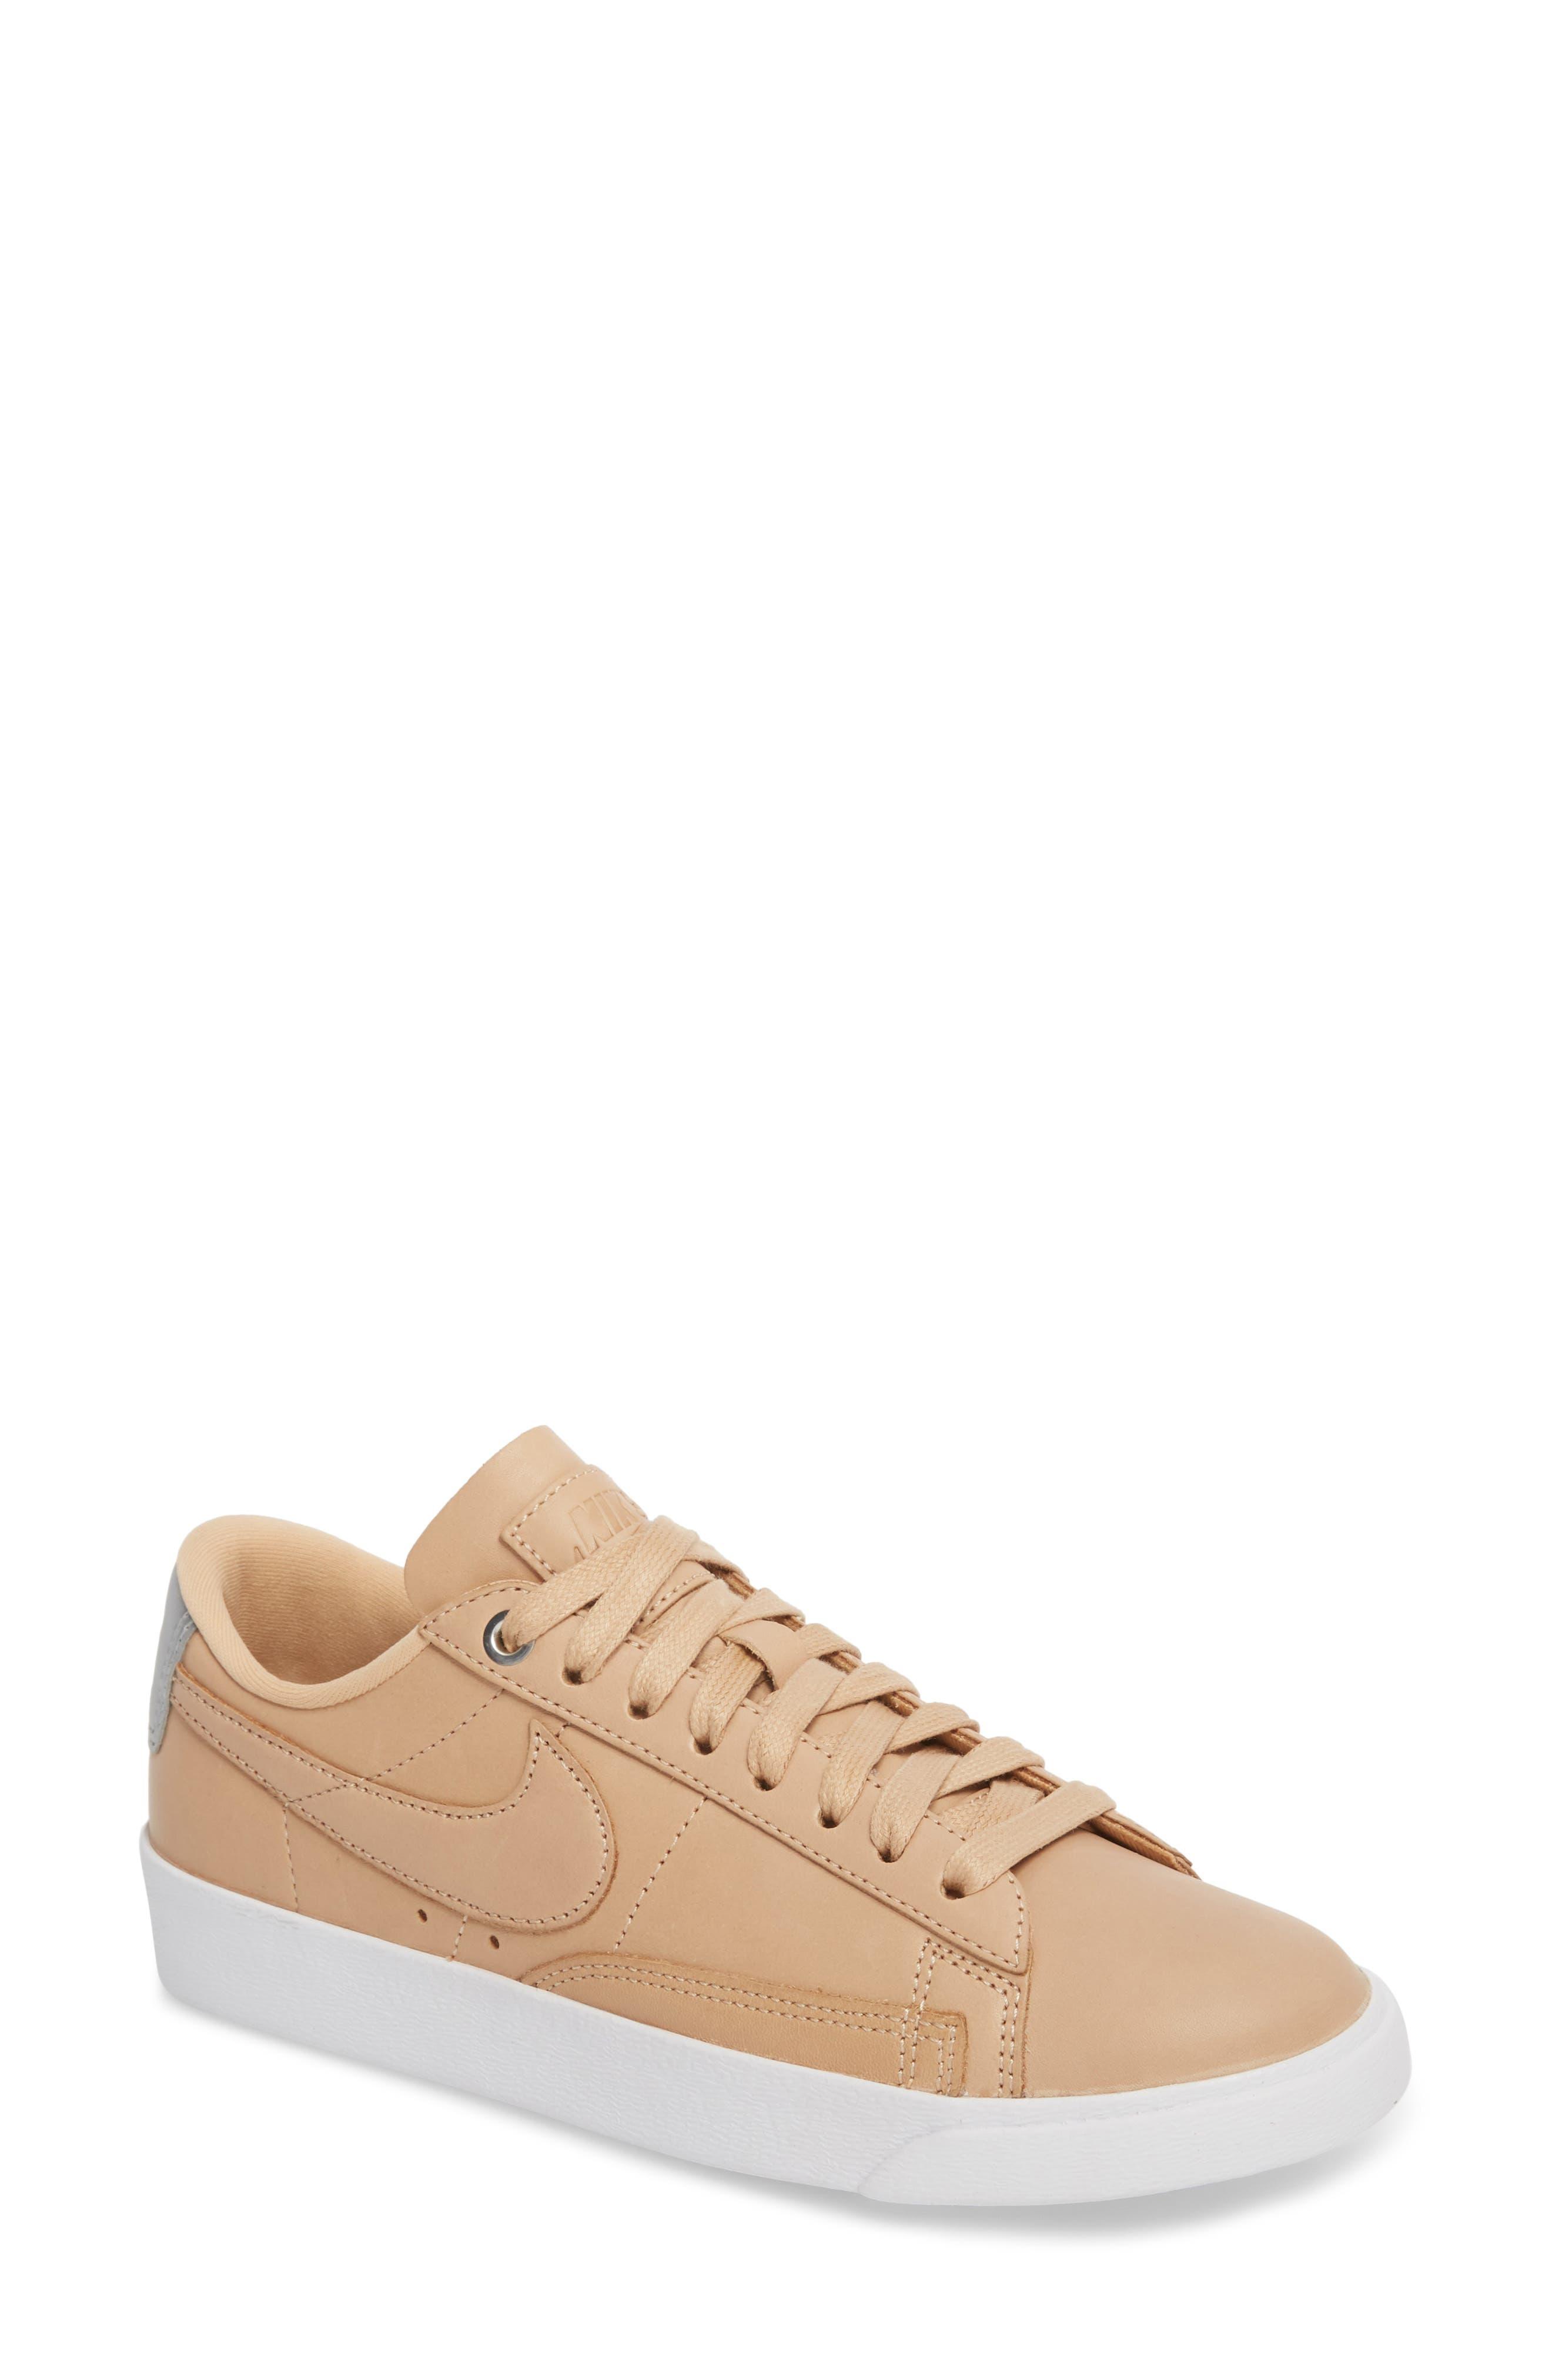 Blazer Low Top Sneaker SE,                             Main thumbnail 1, color,                             BIO BEIGE/ BIO BEIGE